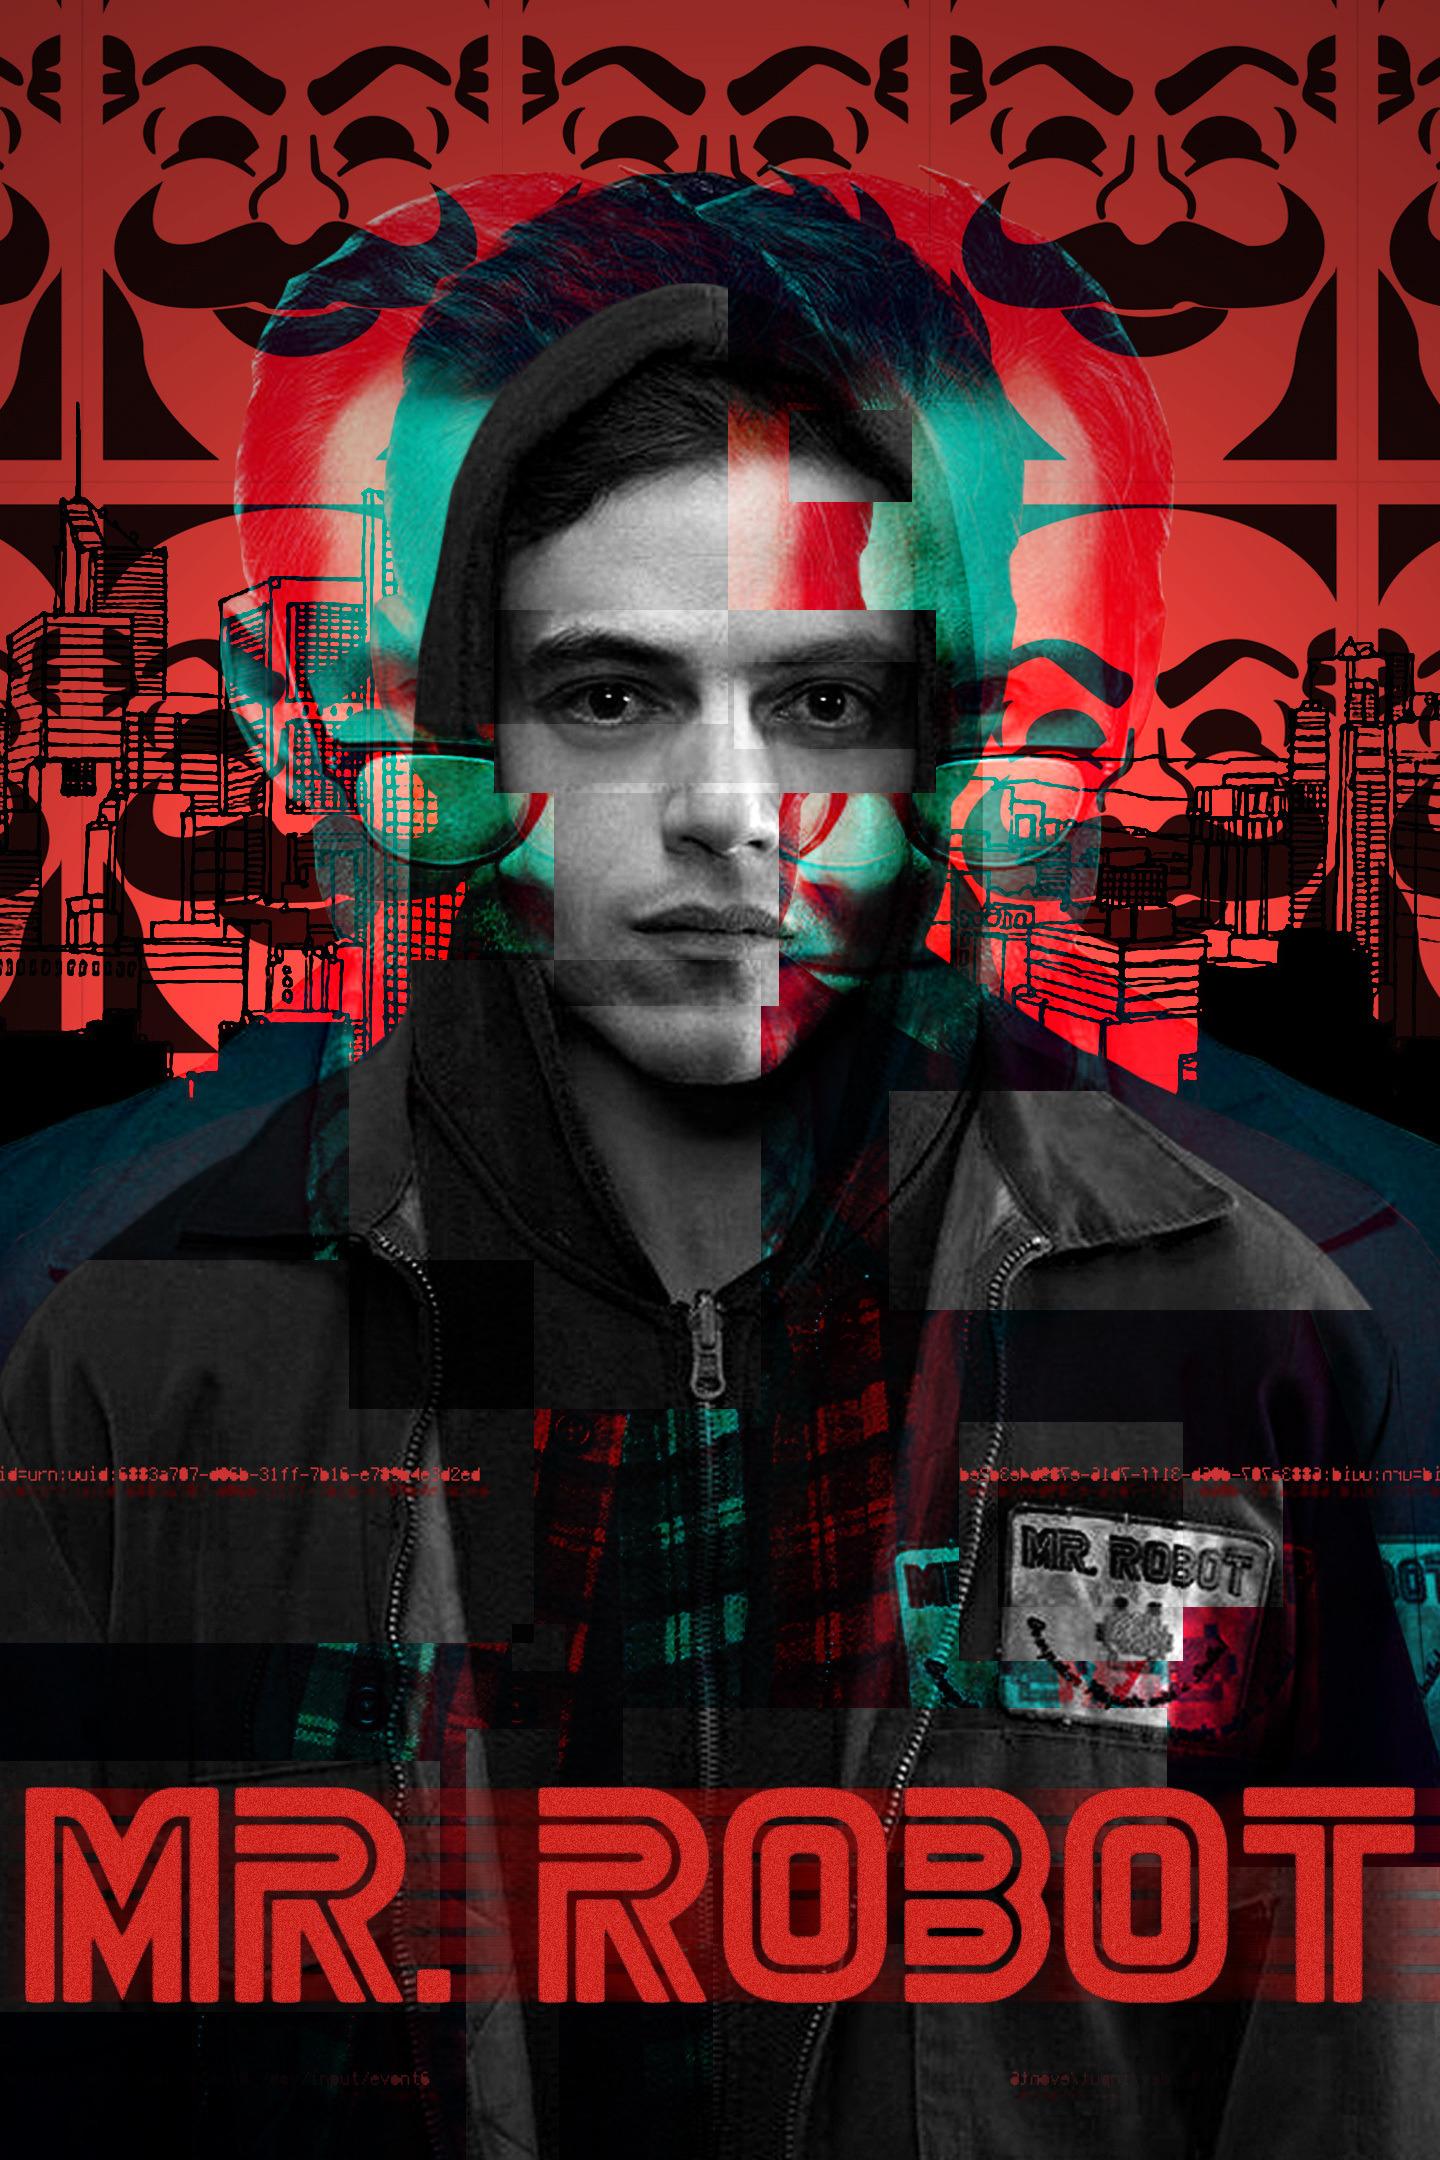 Download 1440x2960 wallpaper mr  robot, glitch art, tv